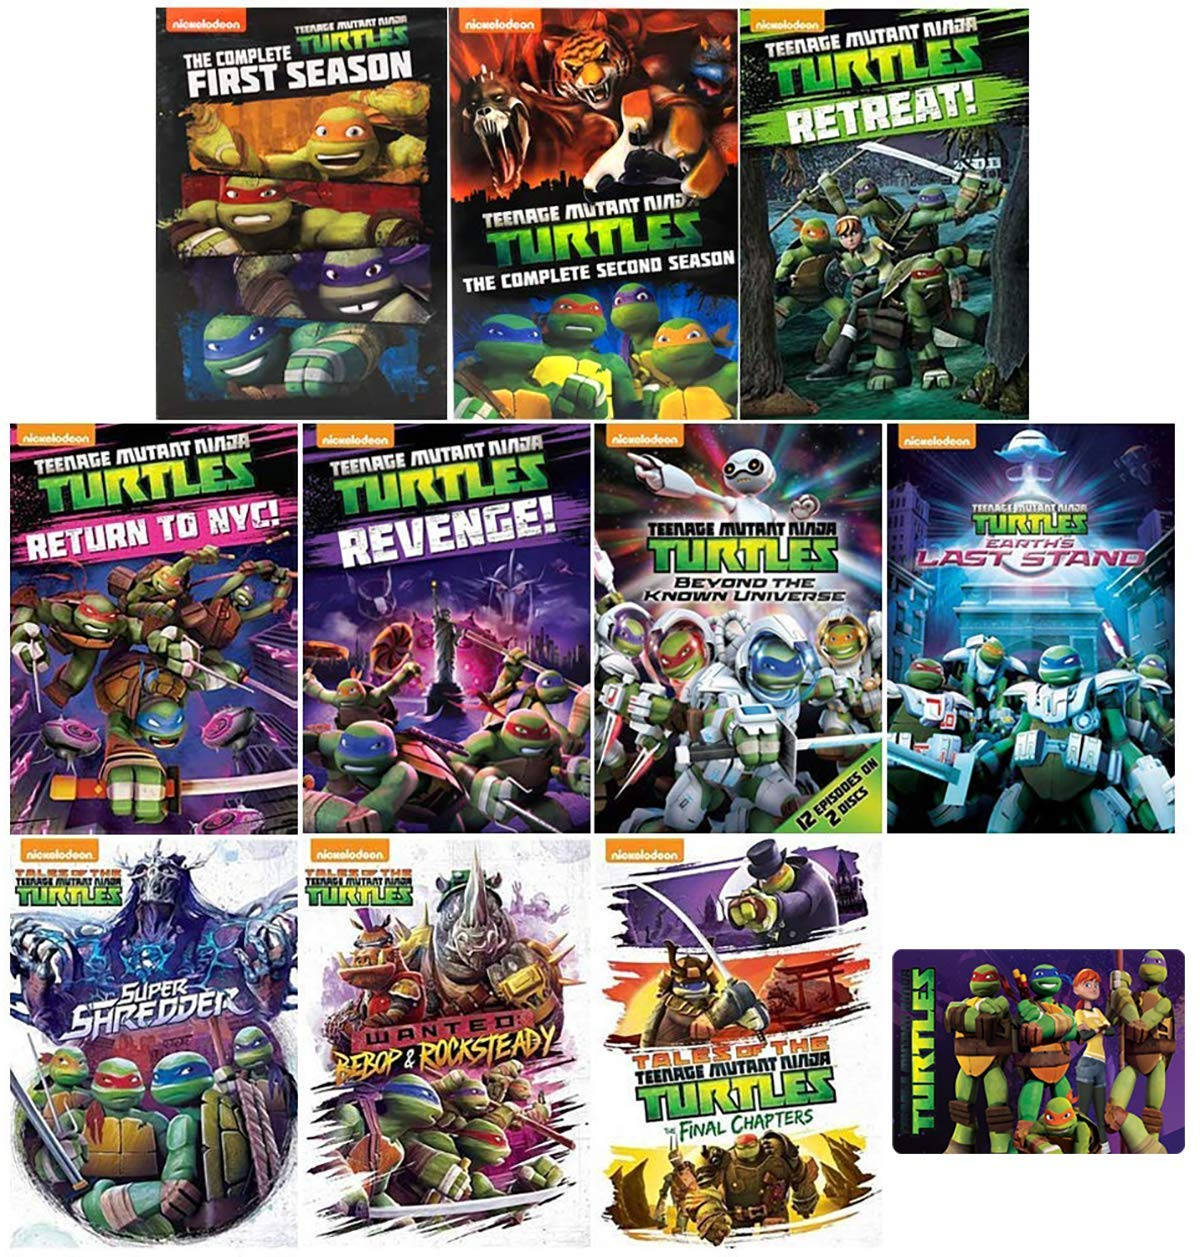 Amazon Com Teenage Mutant Ninja Turtles The Complete Reboot Tv Series Seasons 1 5 Dvd Collection With Bonus Glossy Art Card Sean Astin Rob Paulsen Greg Cipes Movies Tv